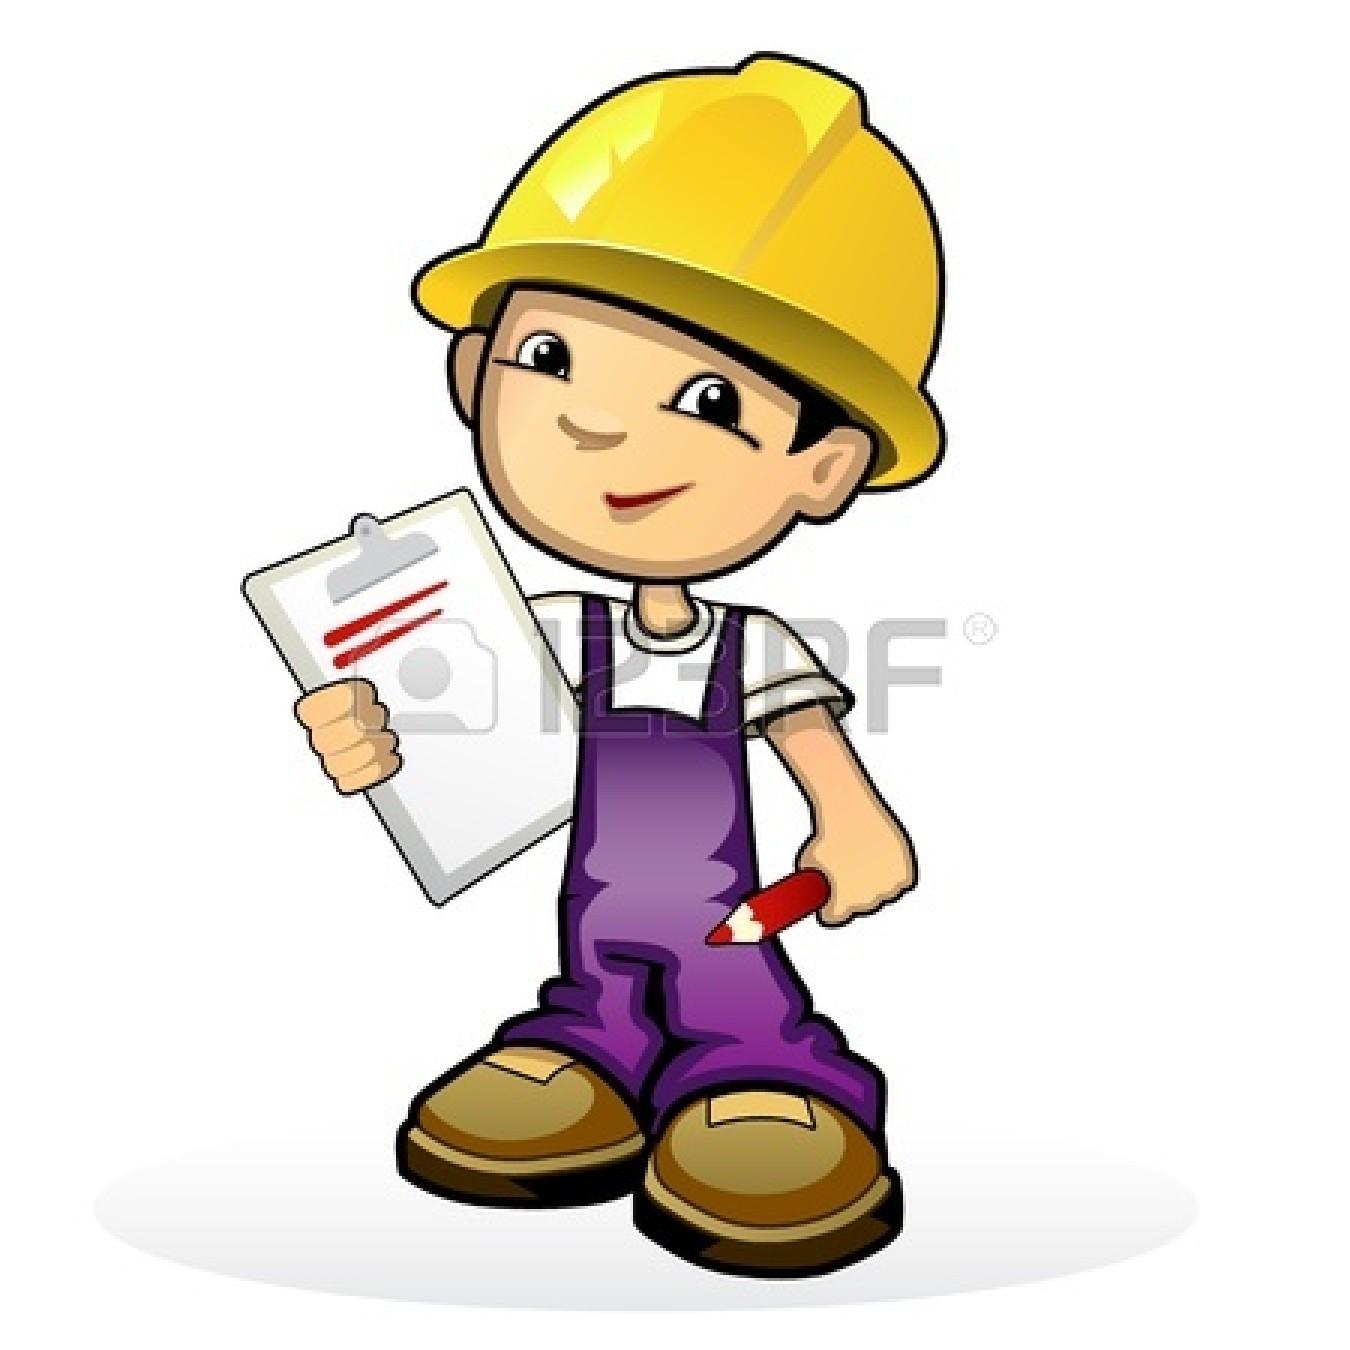 1350x1350 Engineer Clipart Engineer Cartoon Plans Site Clip Art Id 60755